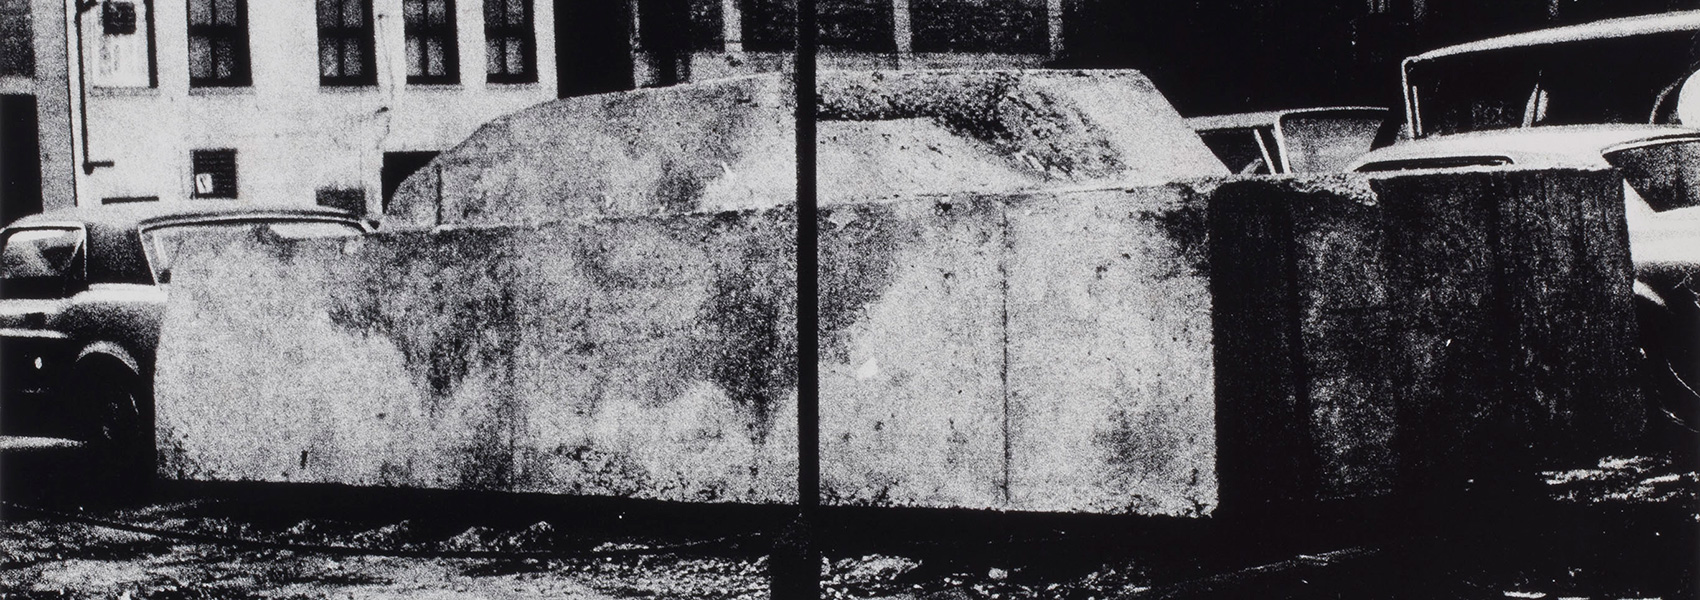 Vostell Concrete 19691973 Smart Museum Of Art